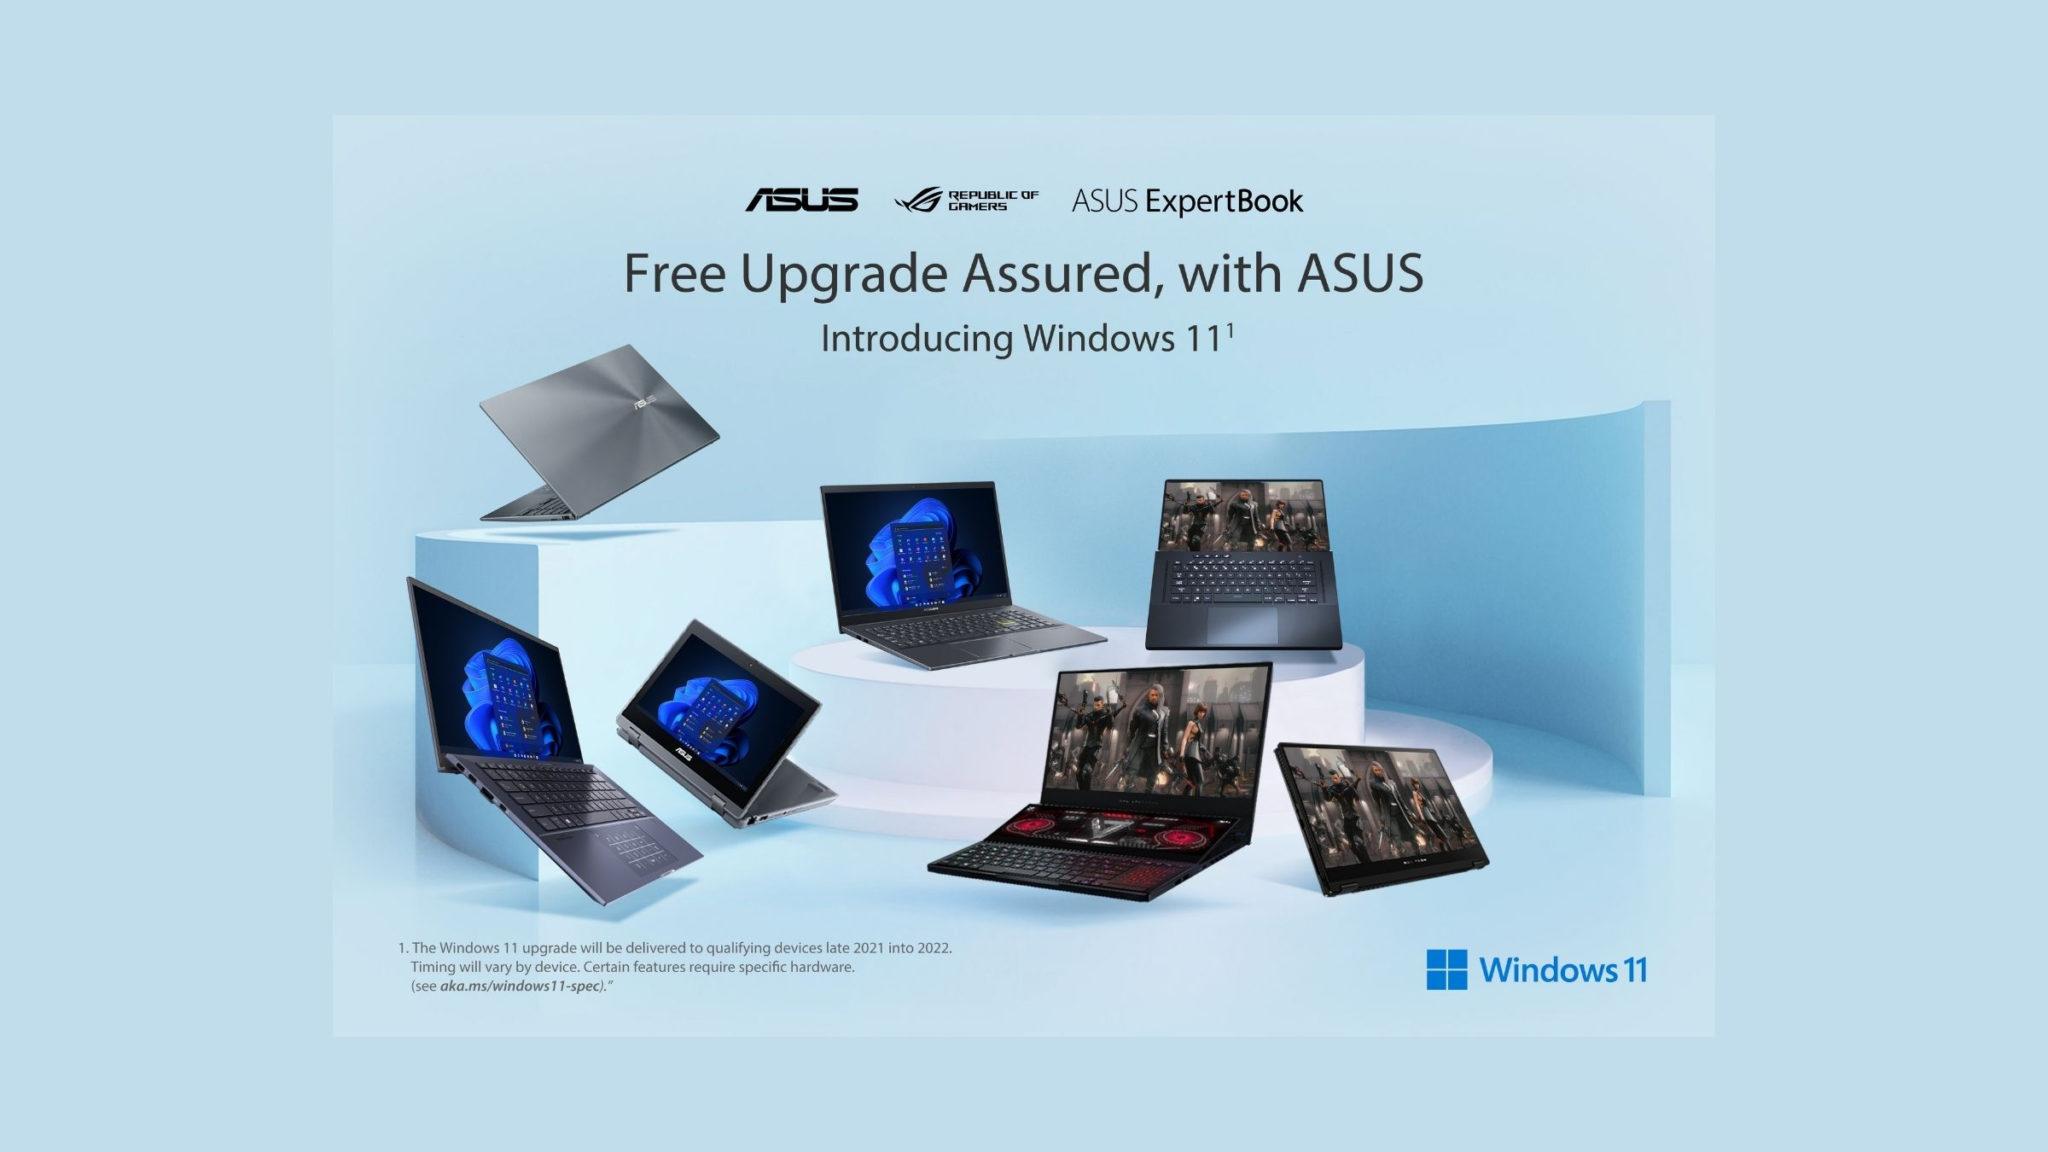 ASUS and ROG Laptops Get Windows 11 Header